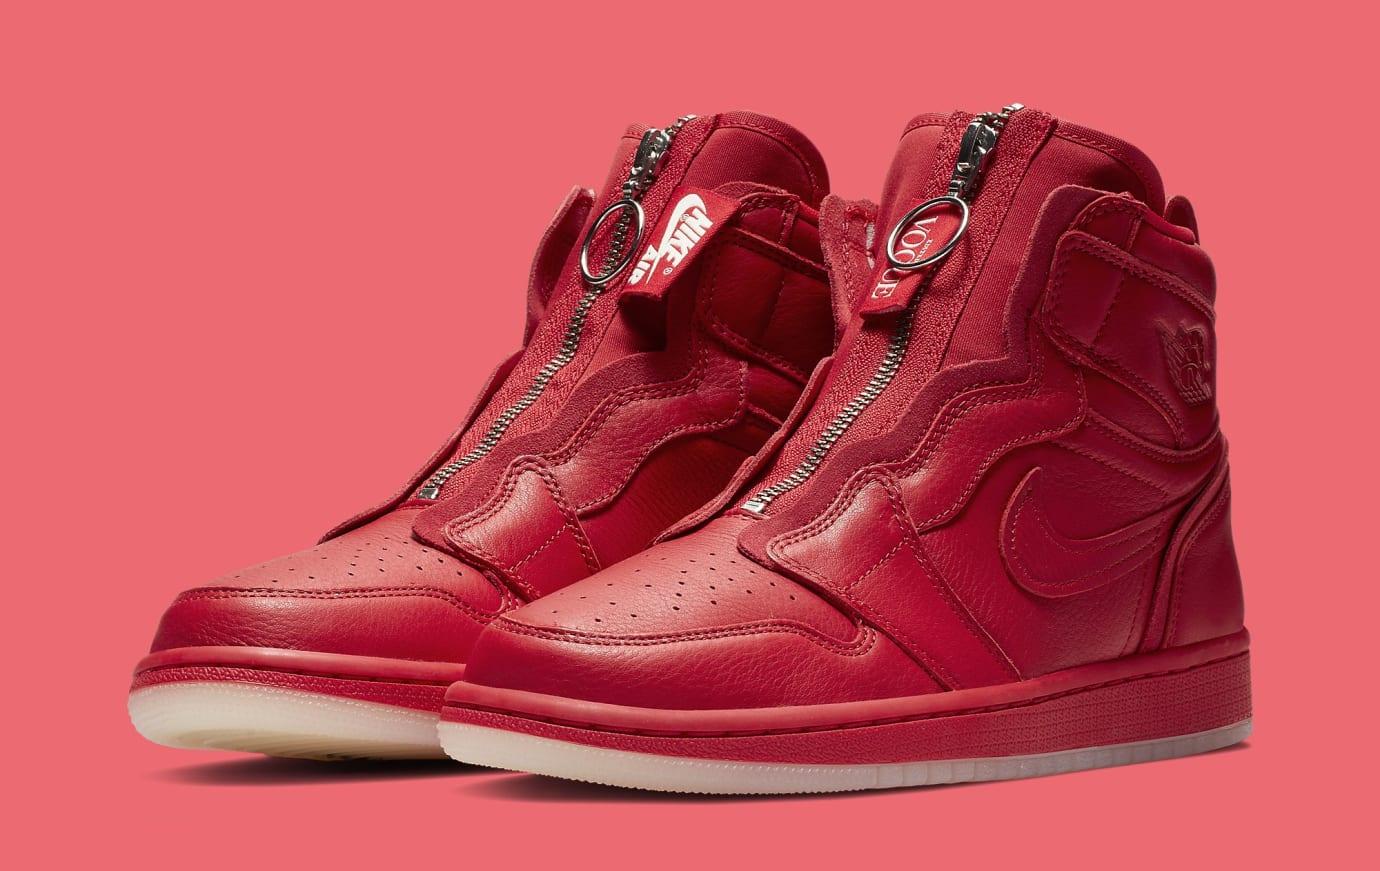 Vogue x Air Jordan 1 Zip AWOK University Red Pair